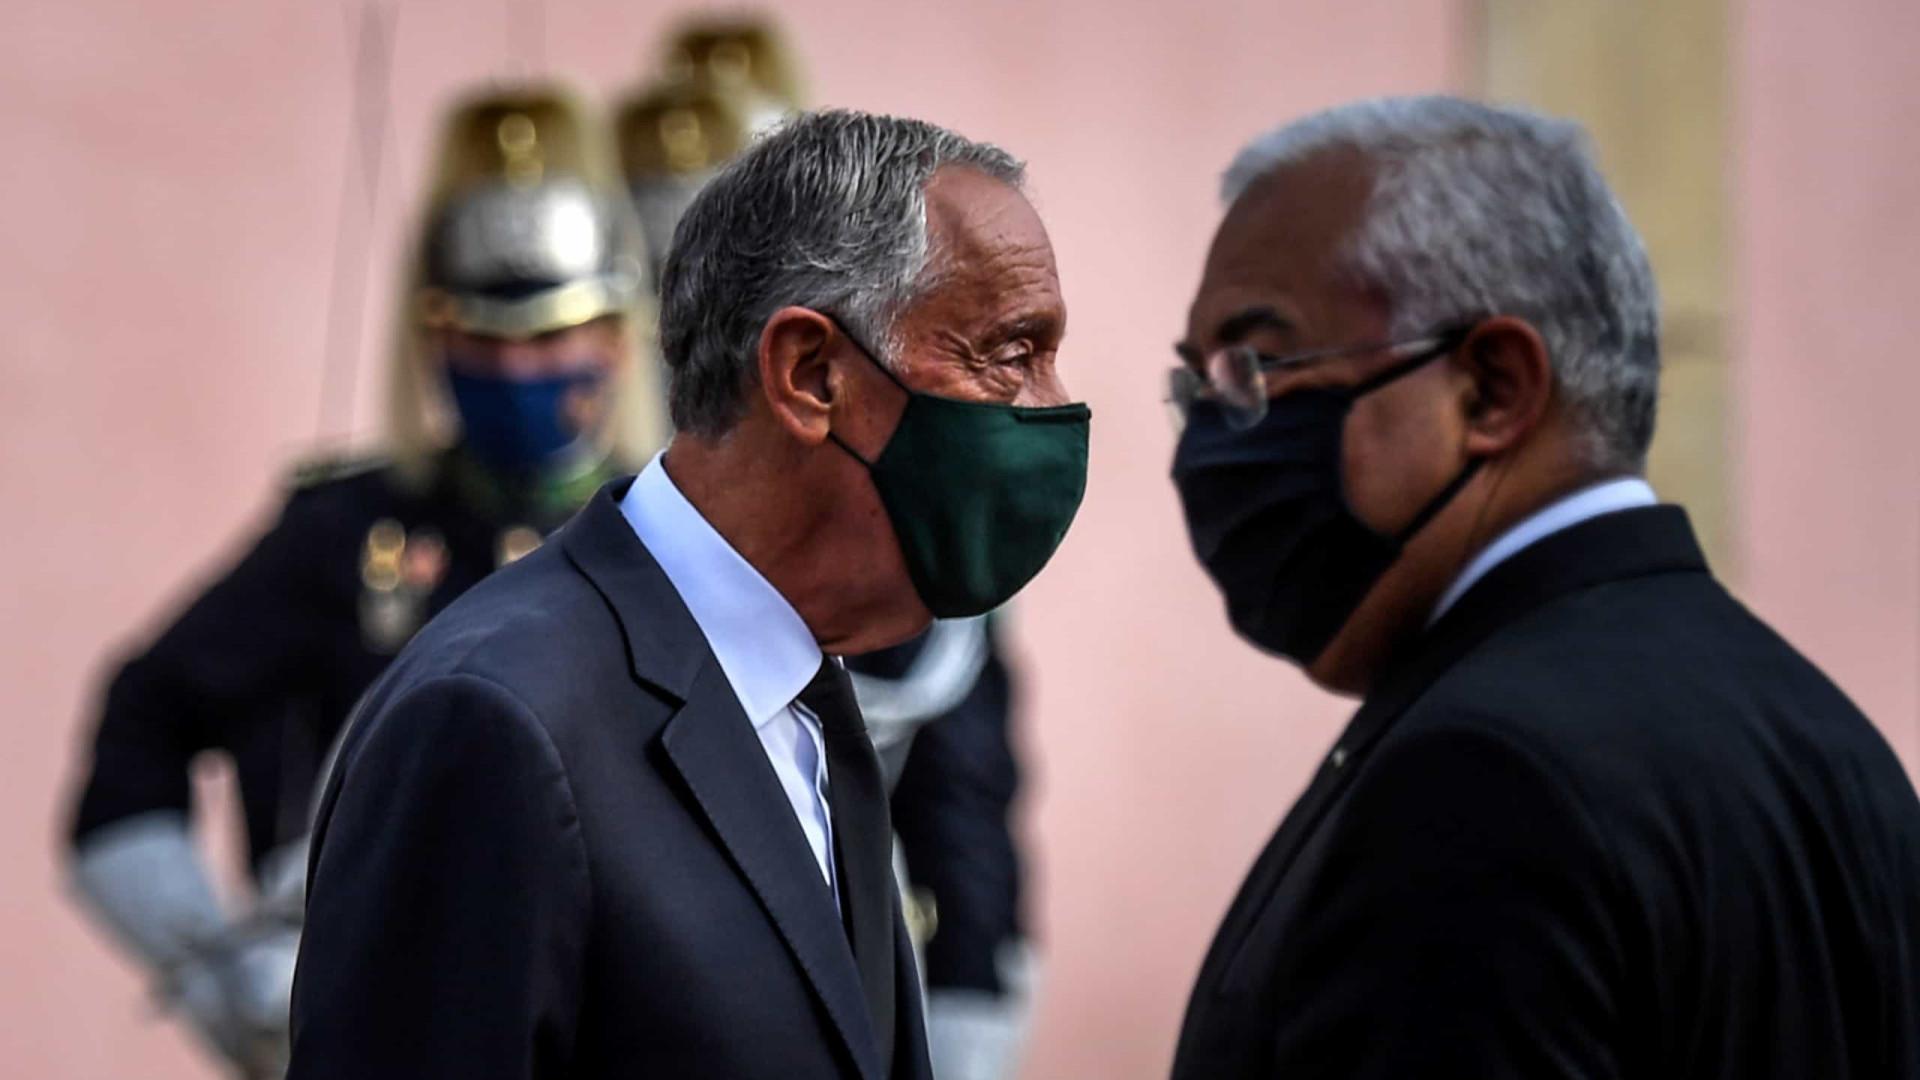 Marcelo e Costa pelo multilateralismo e contra desunião na luta à Covid